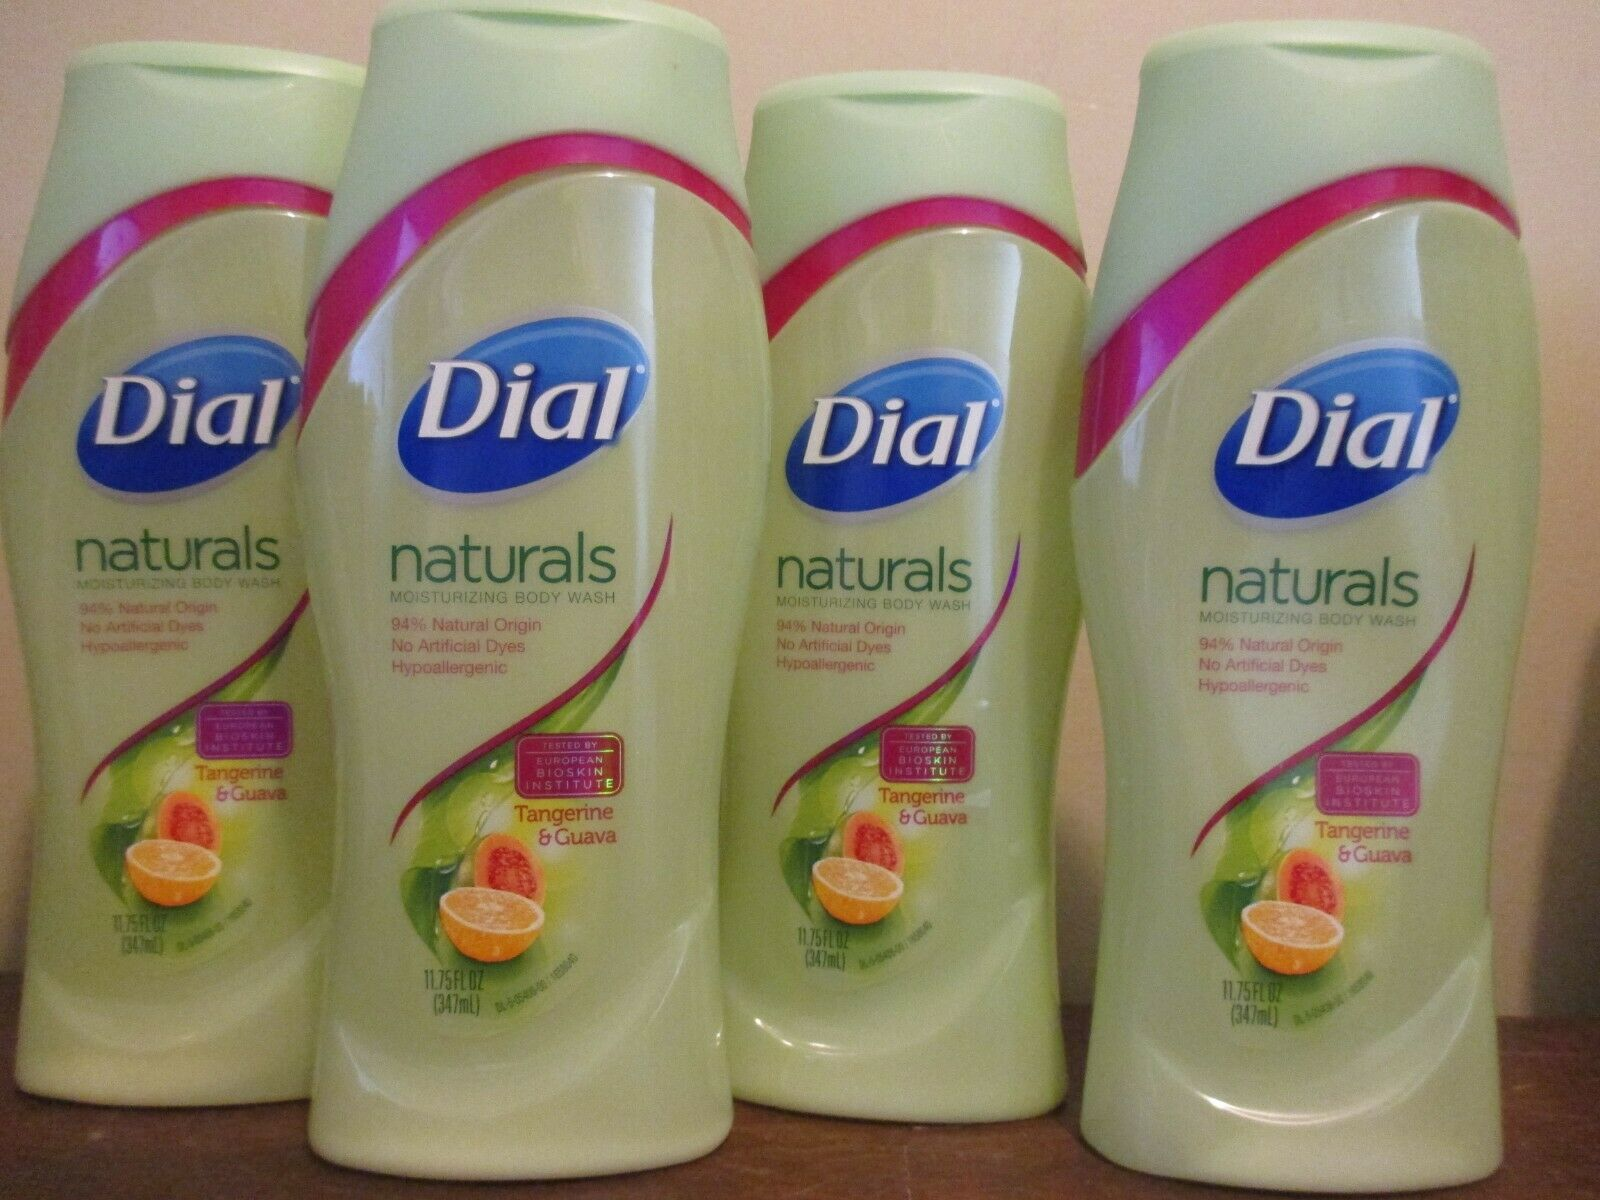 Lot of 4 DIAL NATURALS MOISTURIZING Body Wash TANGERINE GUAVA 11.75 oz